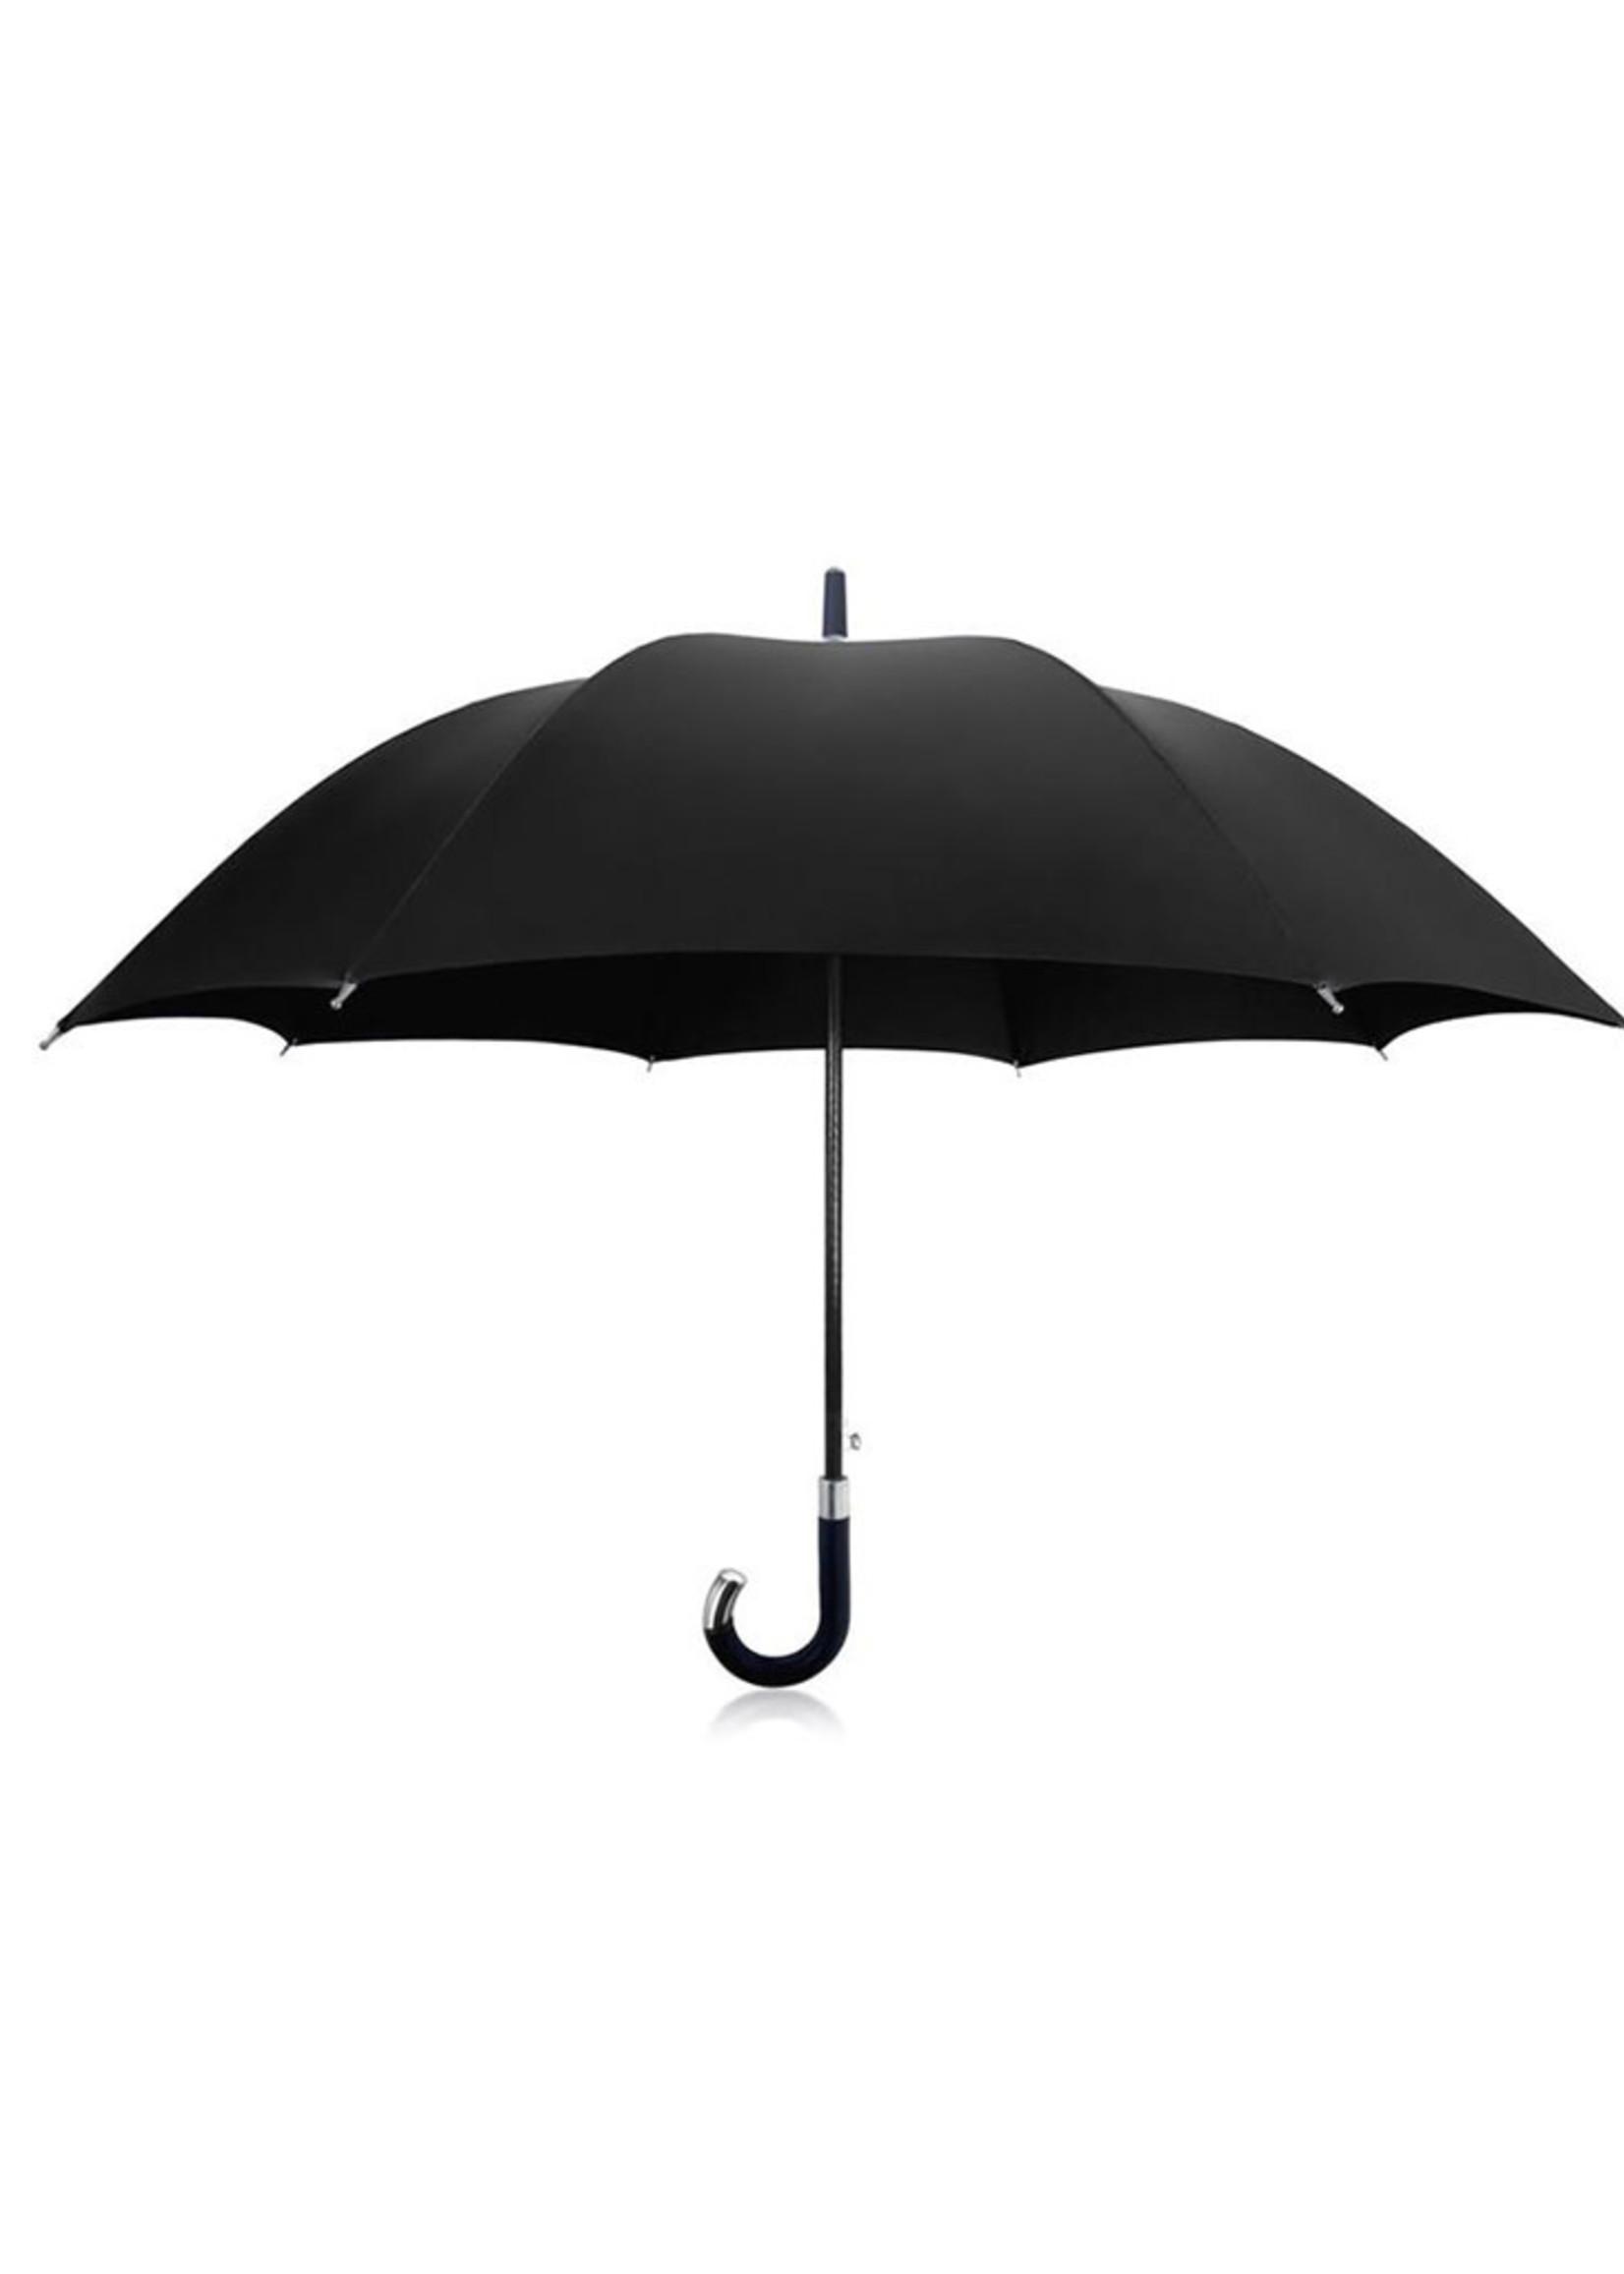 Davek Elite Umbrella Black